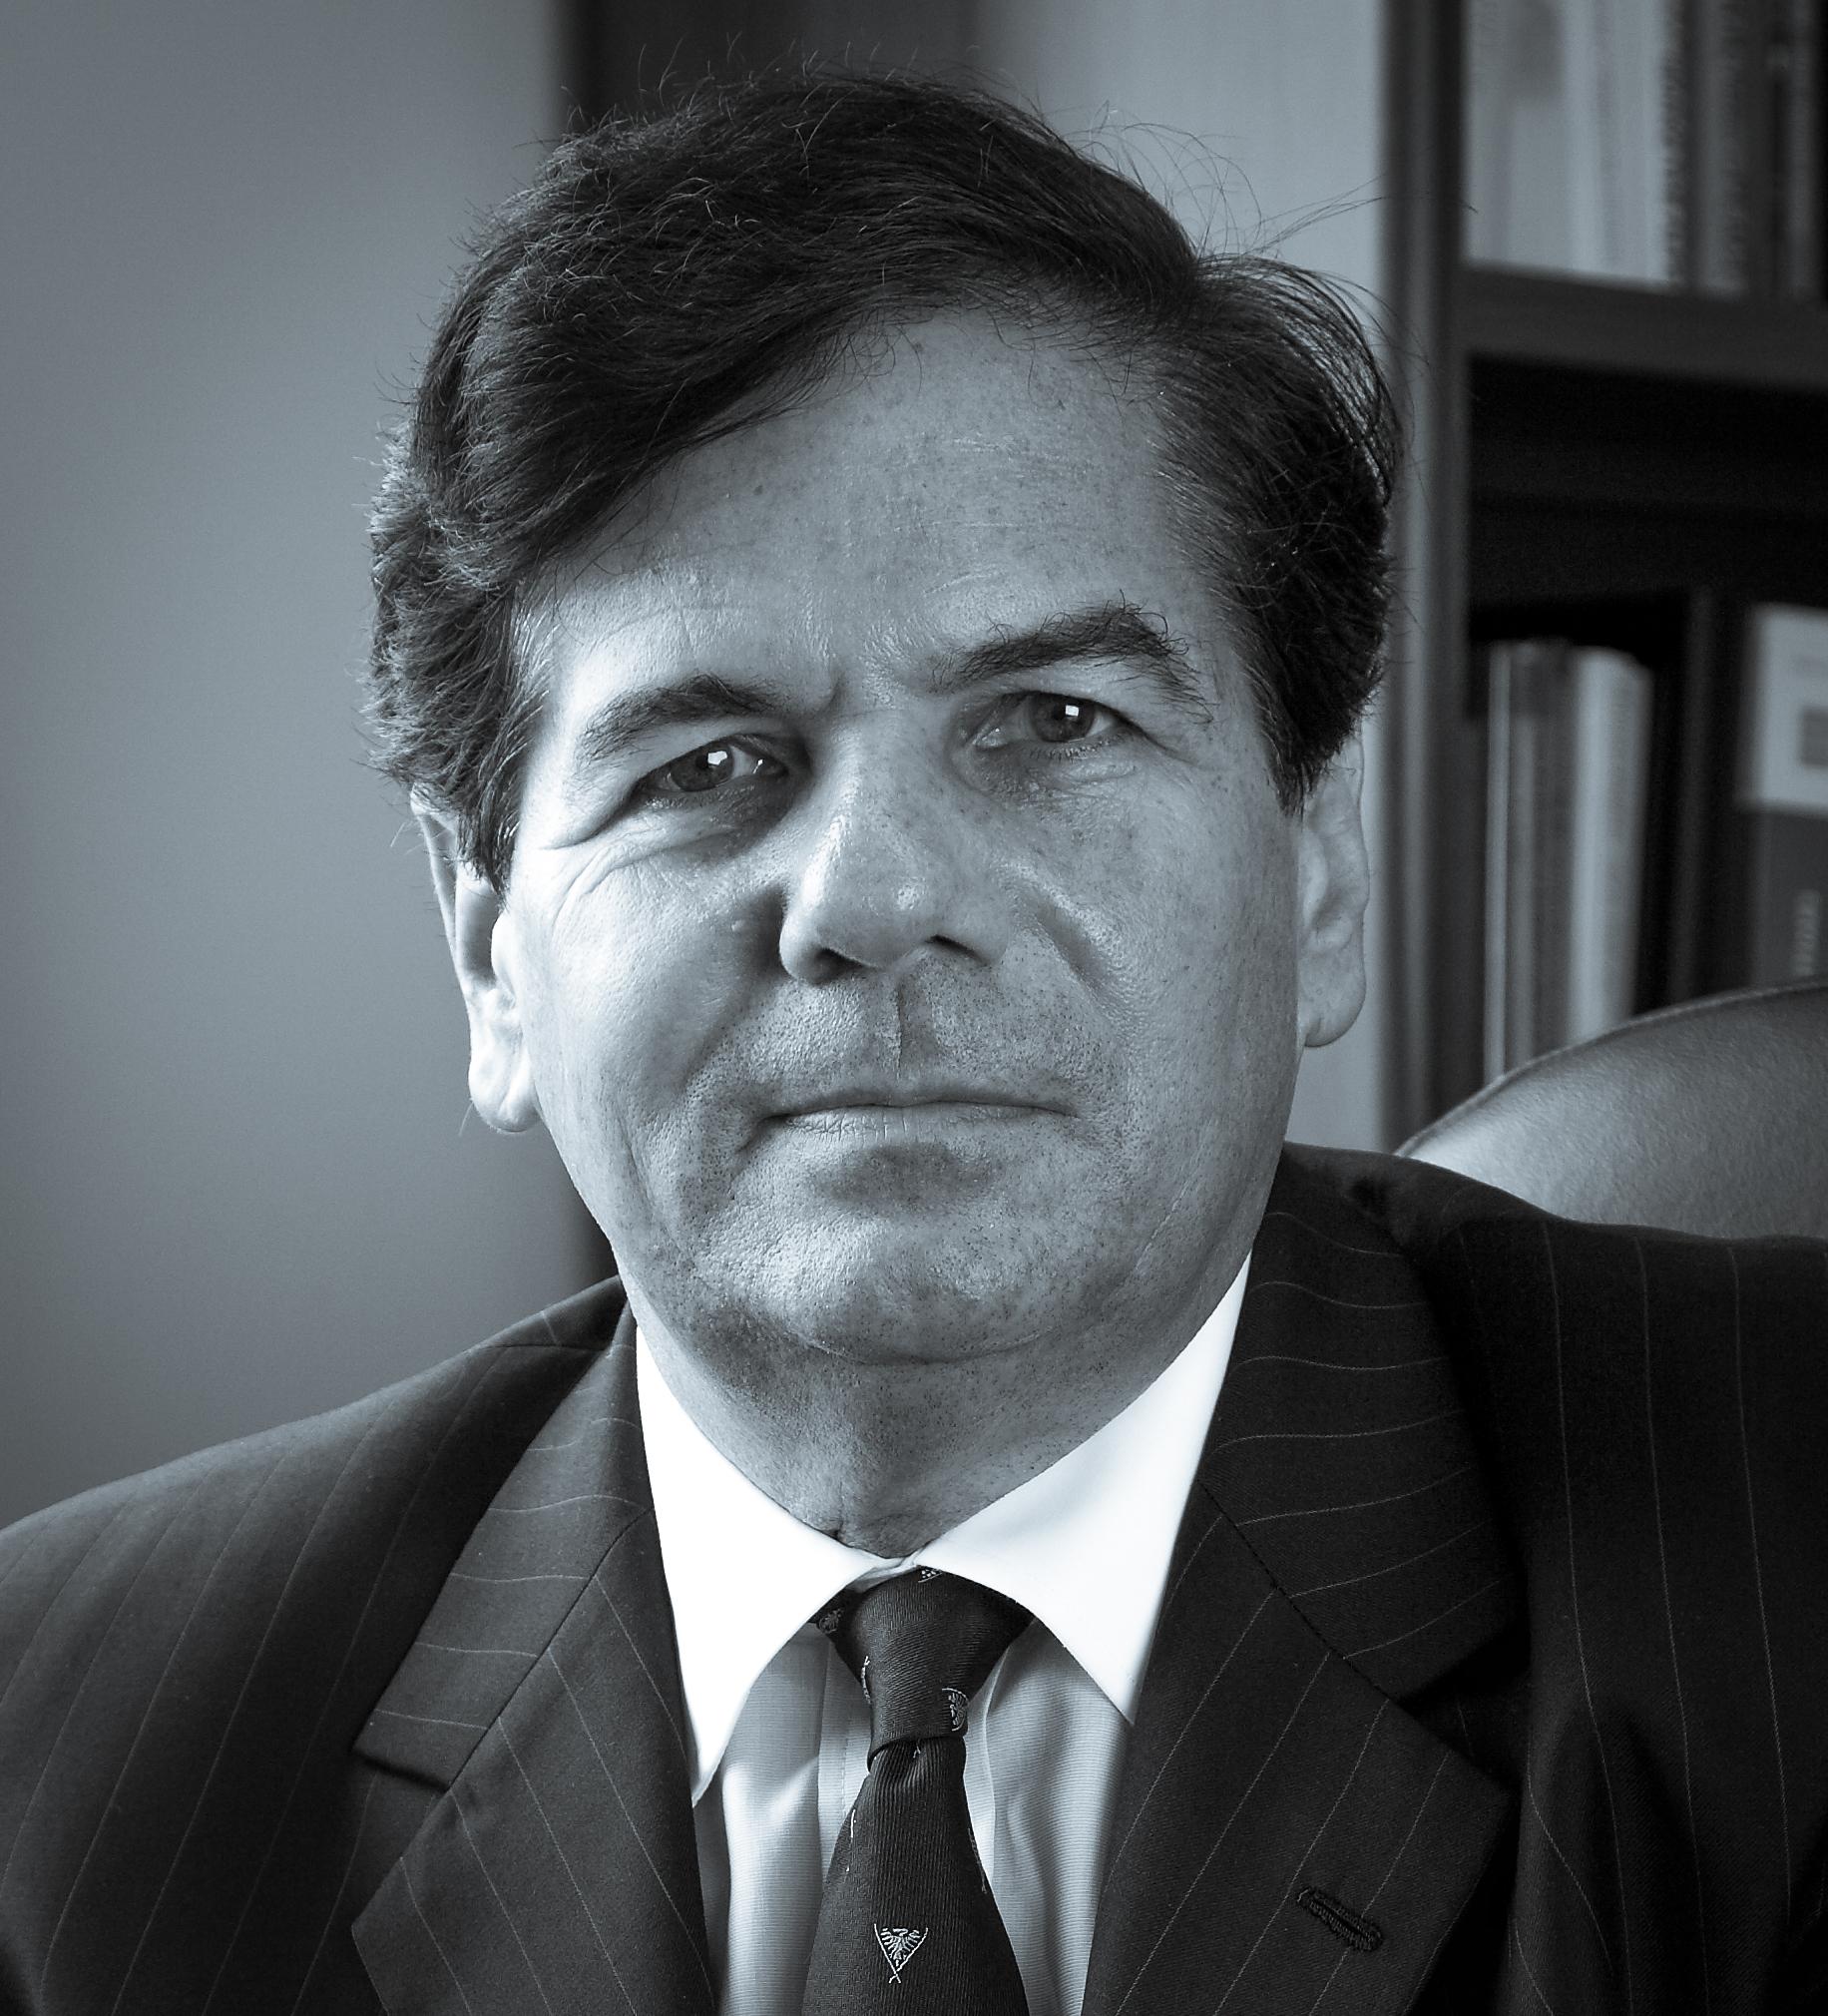 Charles H. Norchi, J.S.D<br>Benjamin Thompson Professor of Law, University of Maine School of Law.